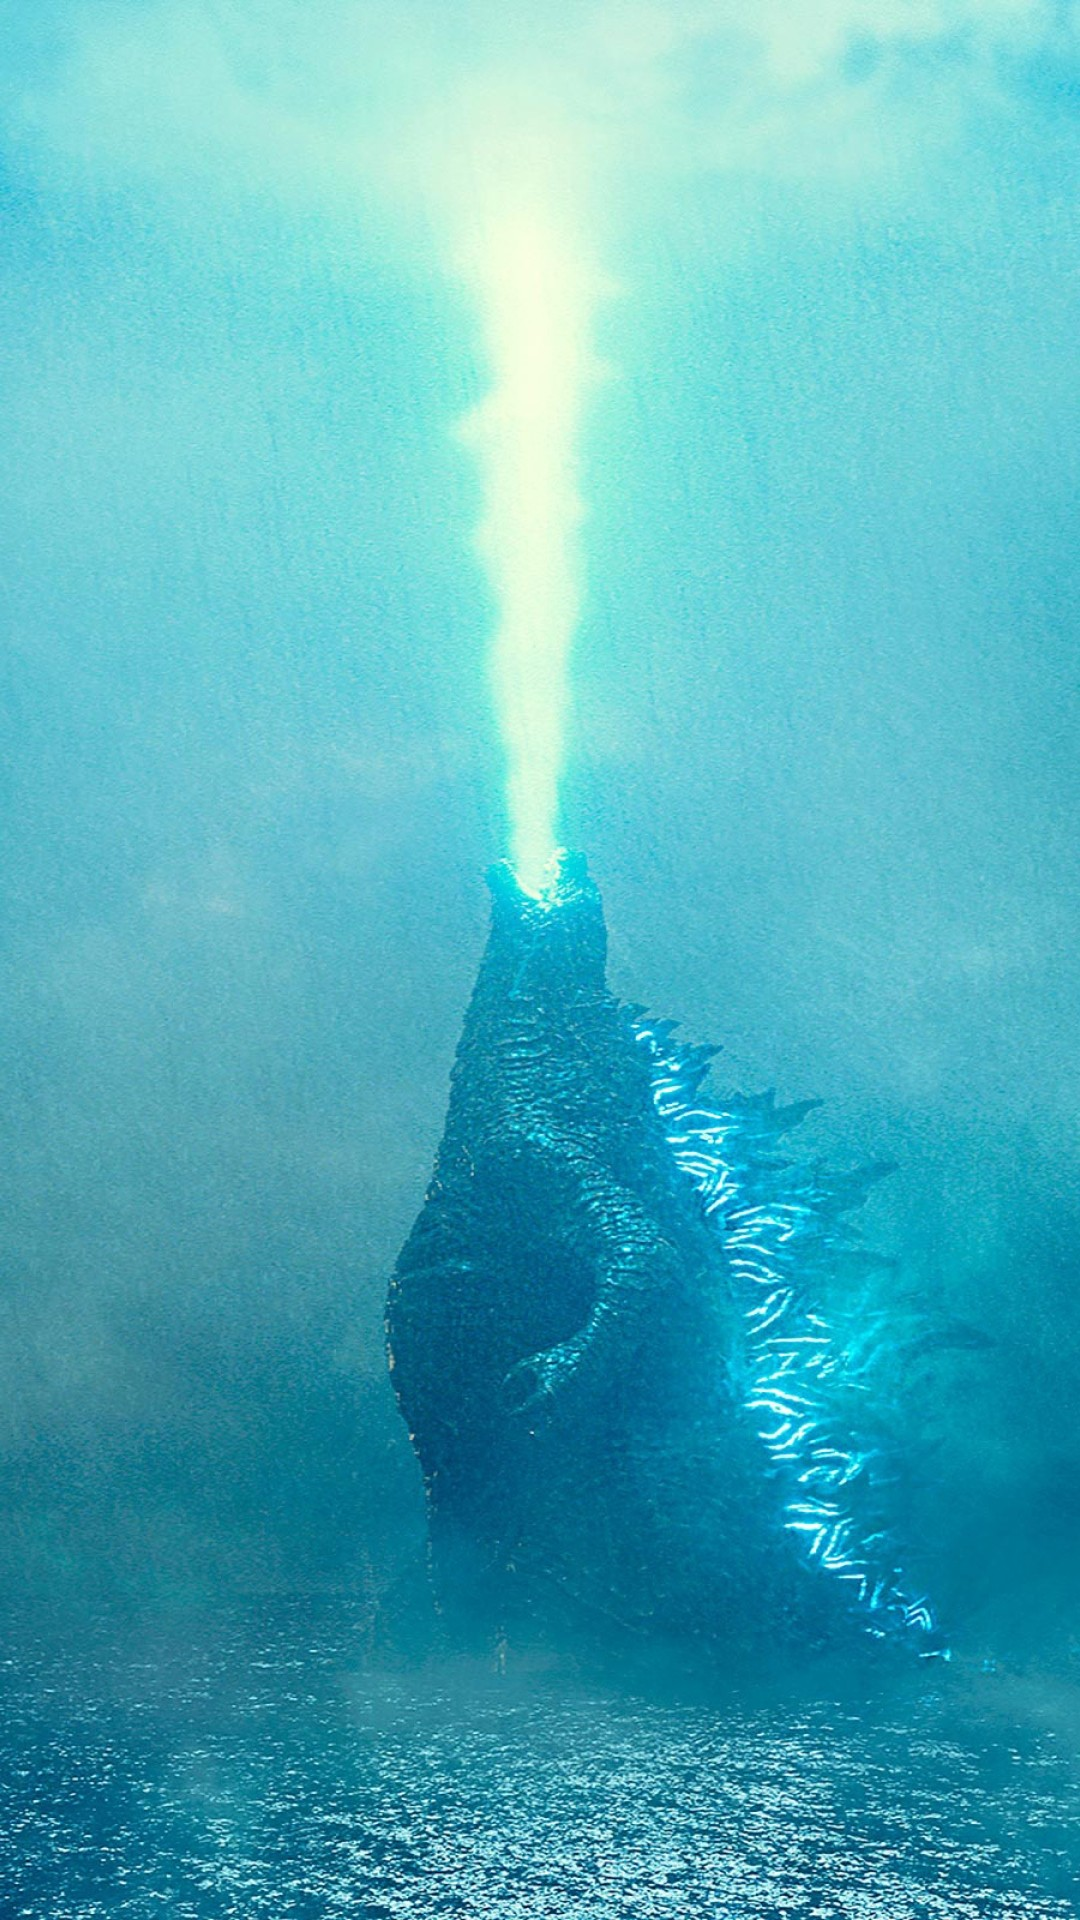 Godzilla wallpaper for iPhone